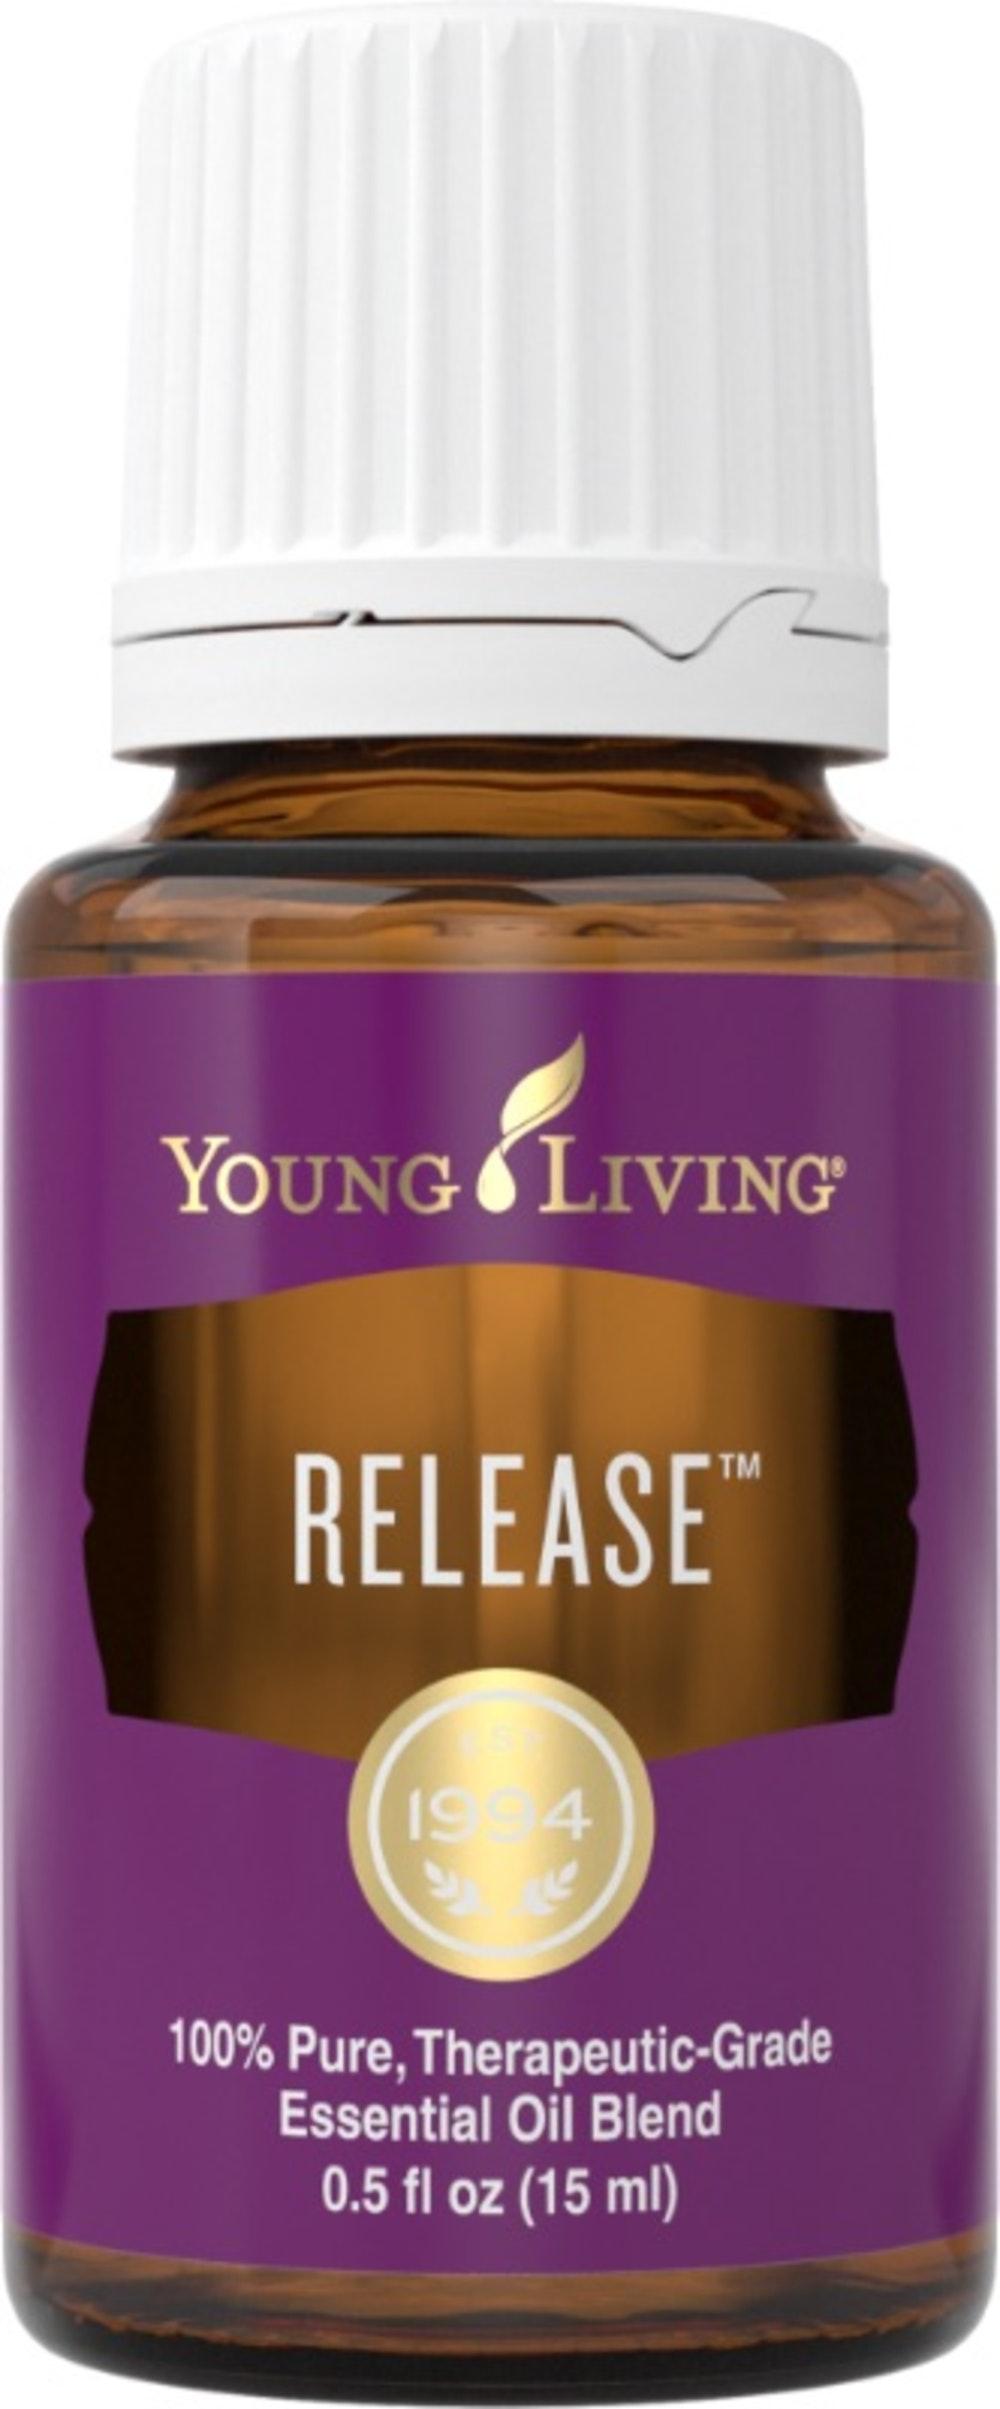 Release Essential Oil